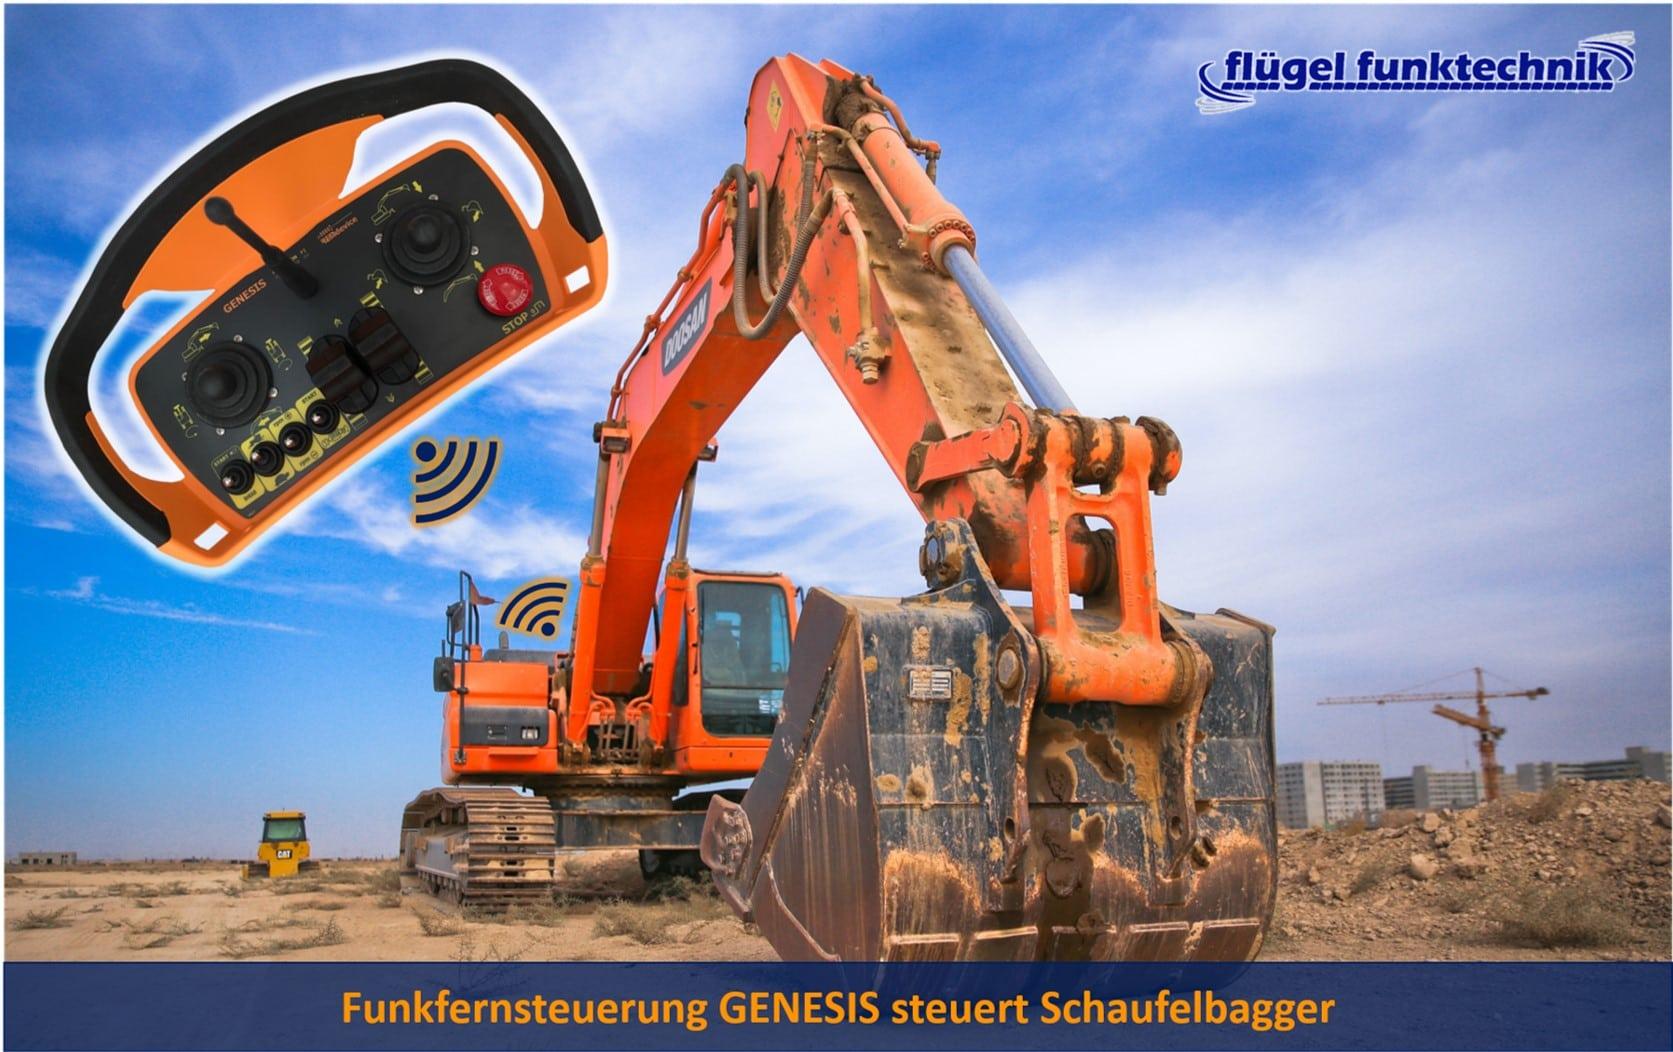 Funkfernsteuerung GENESIS an Schaufelbagger